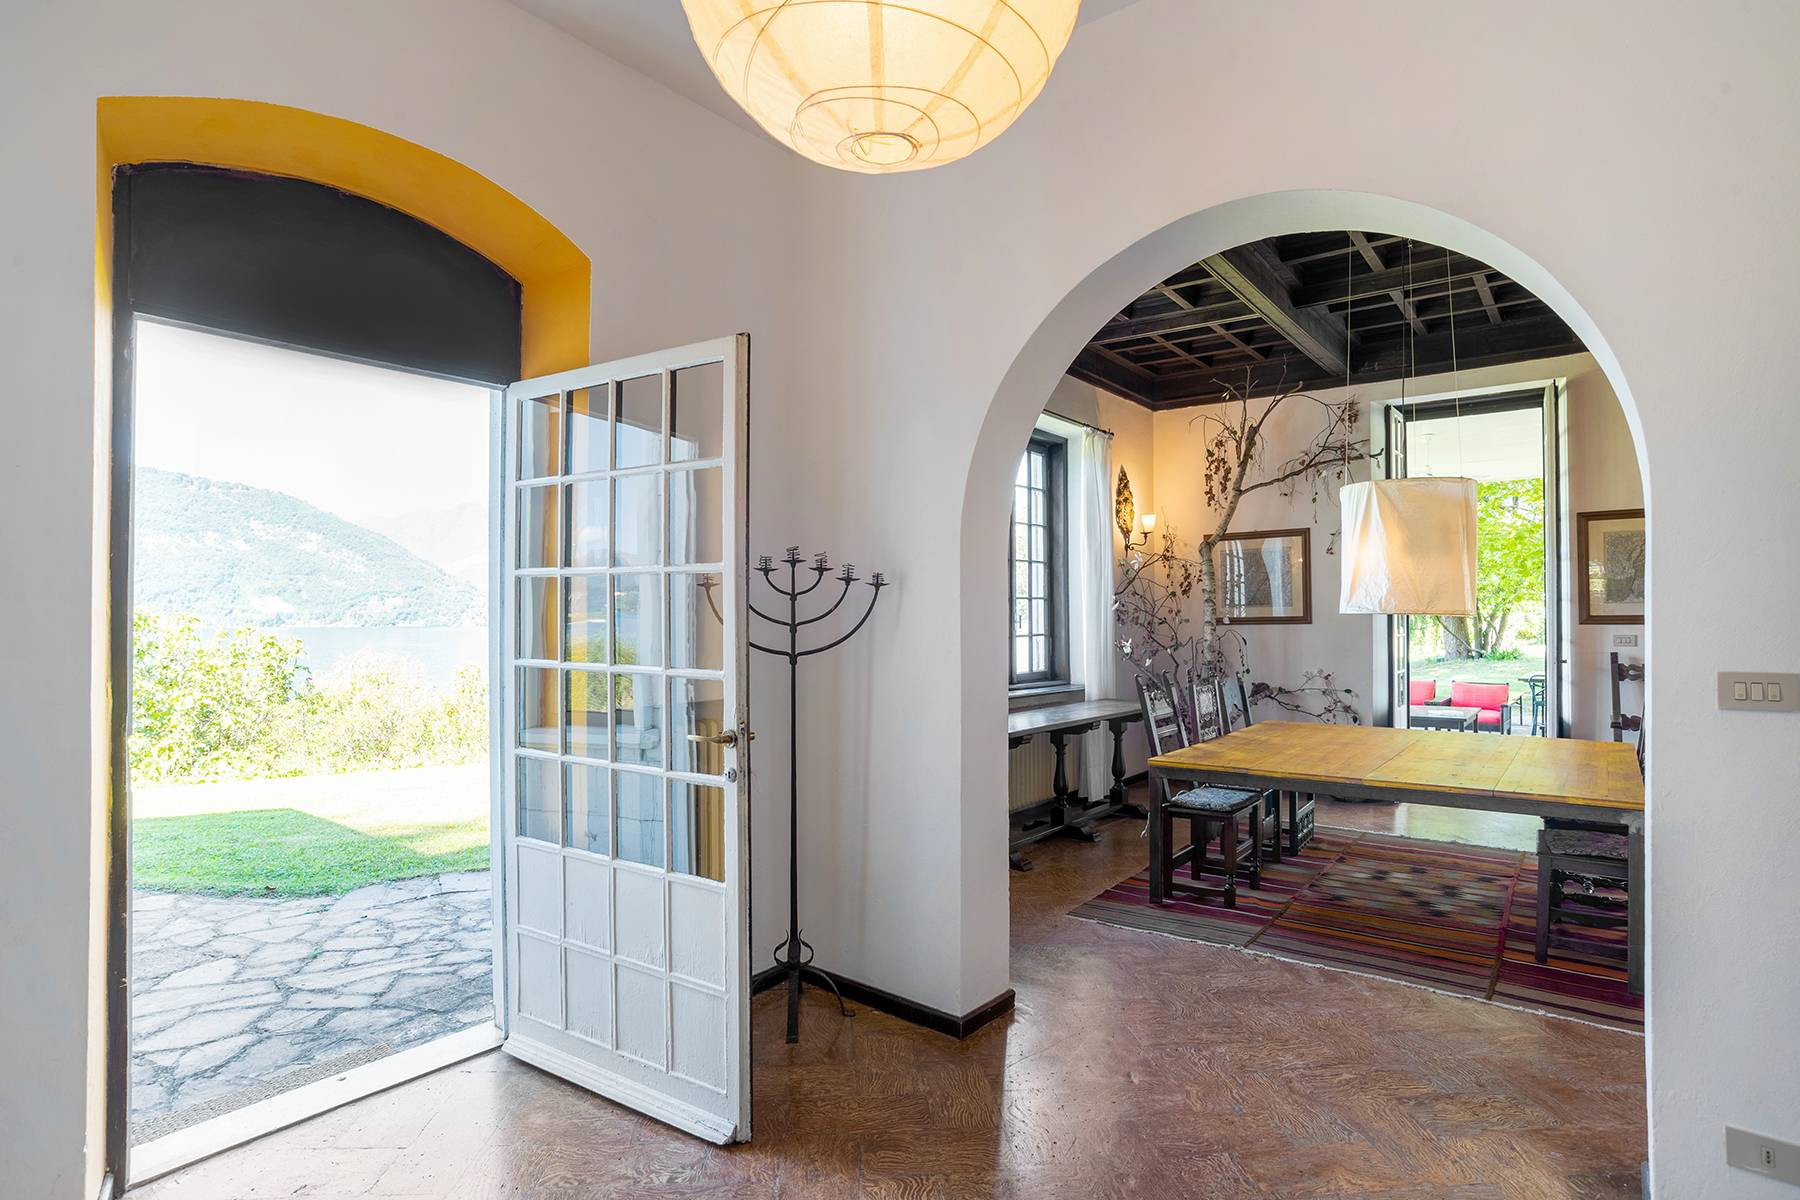 Splendida villa d'epoca con vista lago mozzafiato - 13